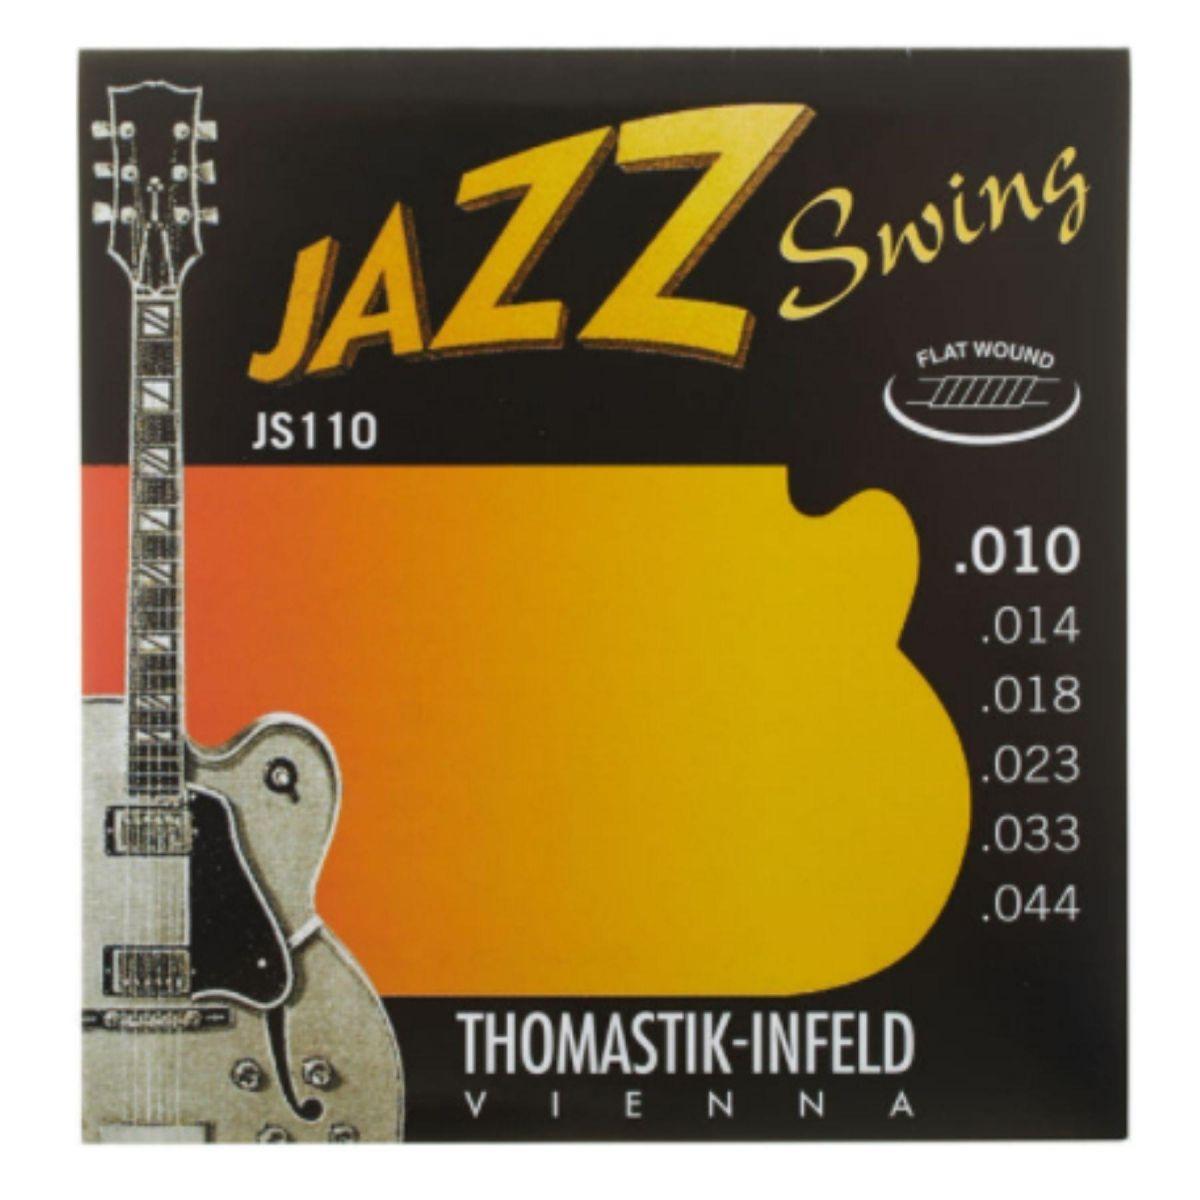 Corde elettrica Thomastik JS110 jazz swing 10-44